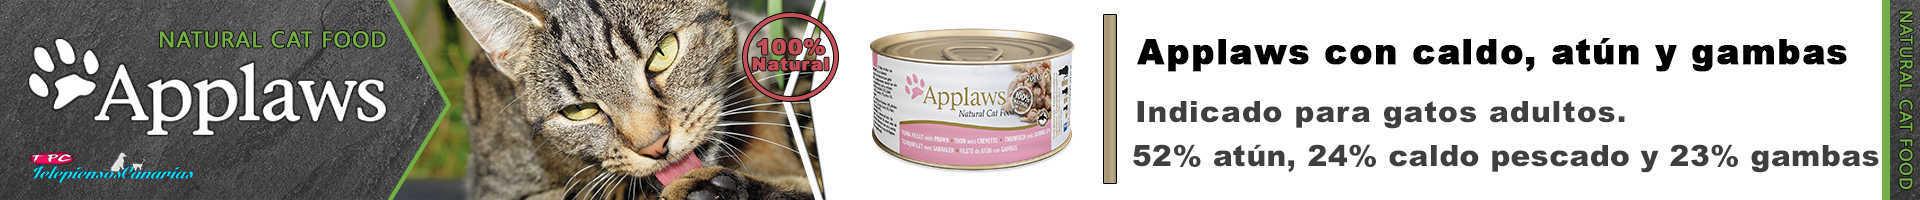 Applaws lata con caldo, atún y gambas para gatos adultos